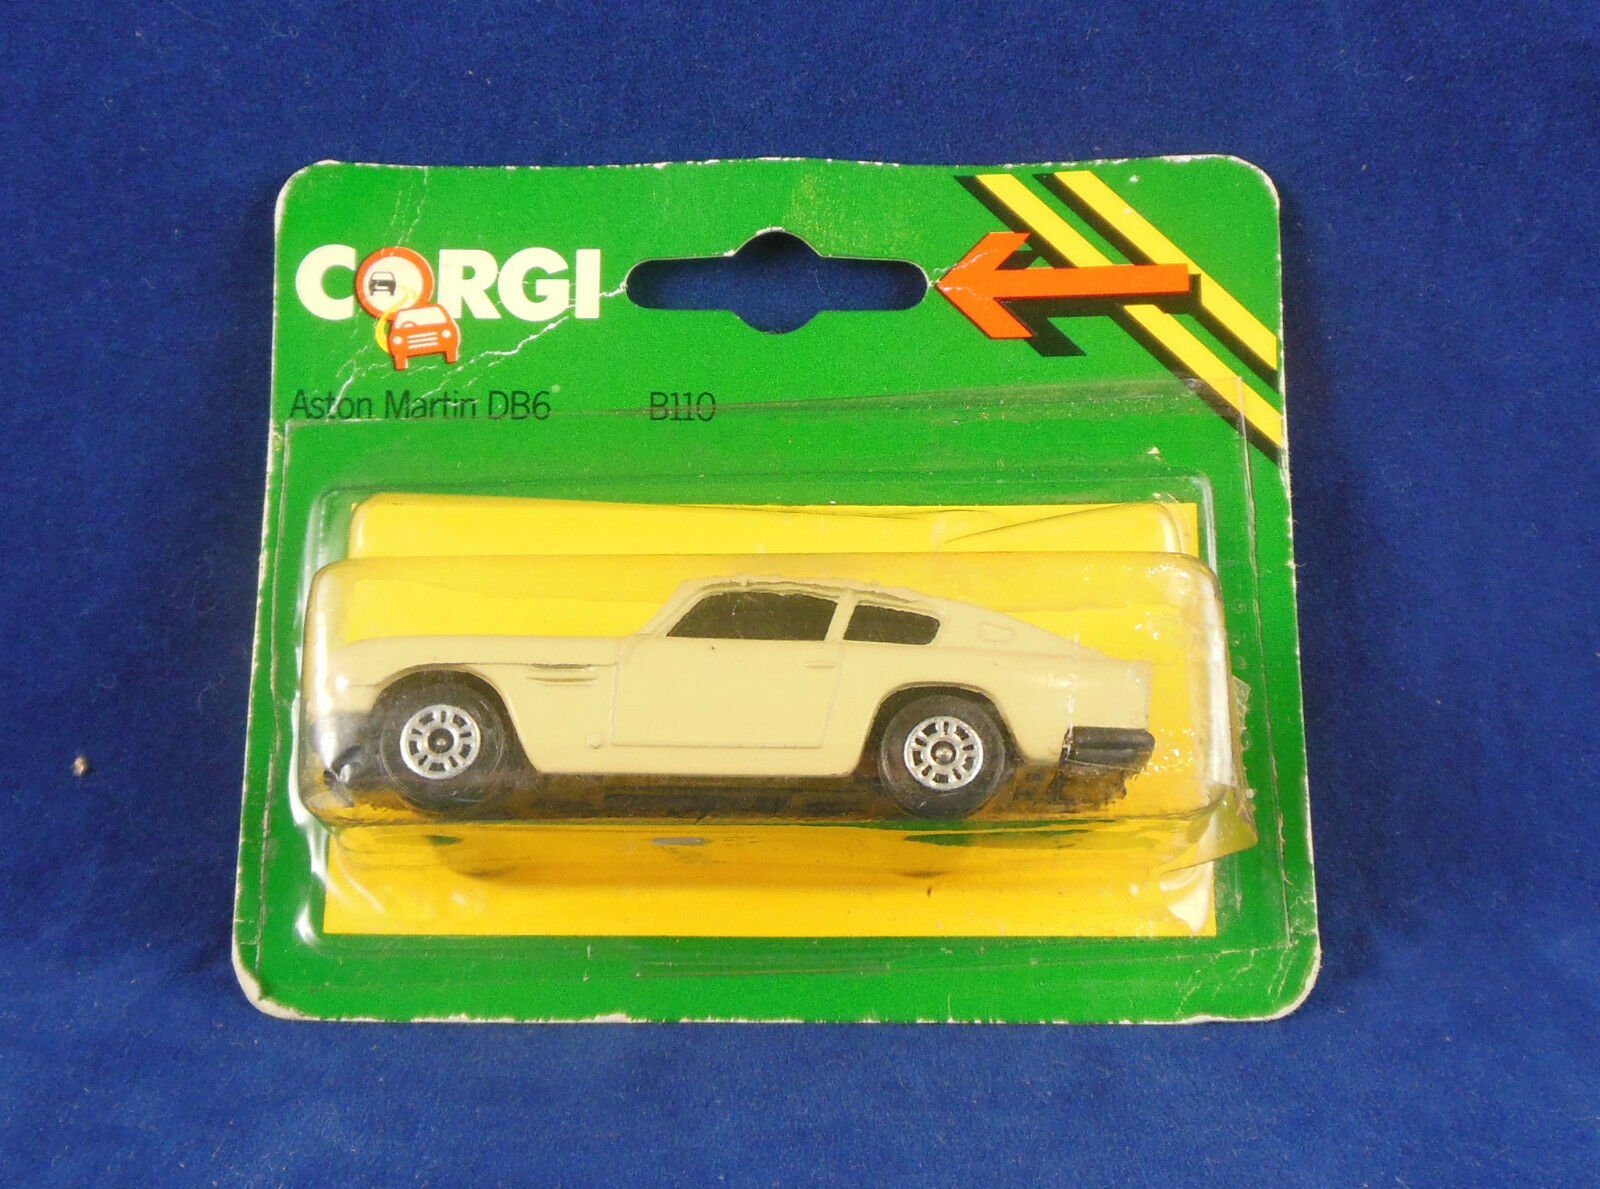 Extrêmement rare 1984 1984 1984 CORGI JUNIORS B110 Aston Martin DB6 en Beige Couleur RARE 39d761